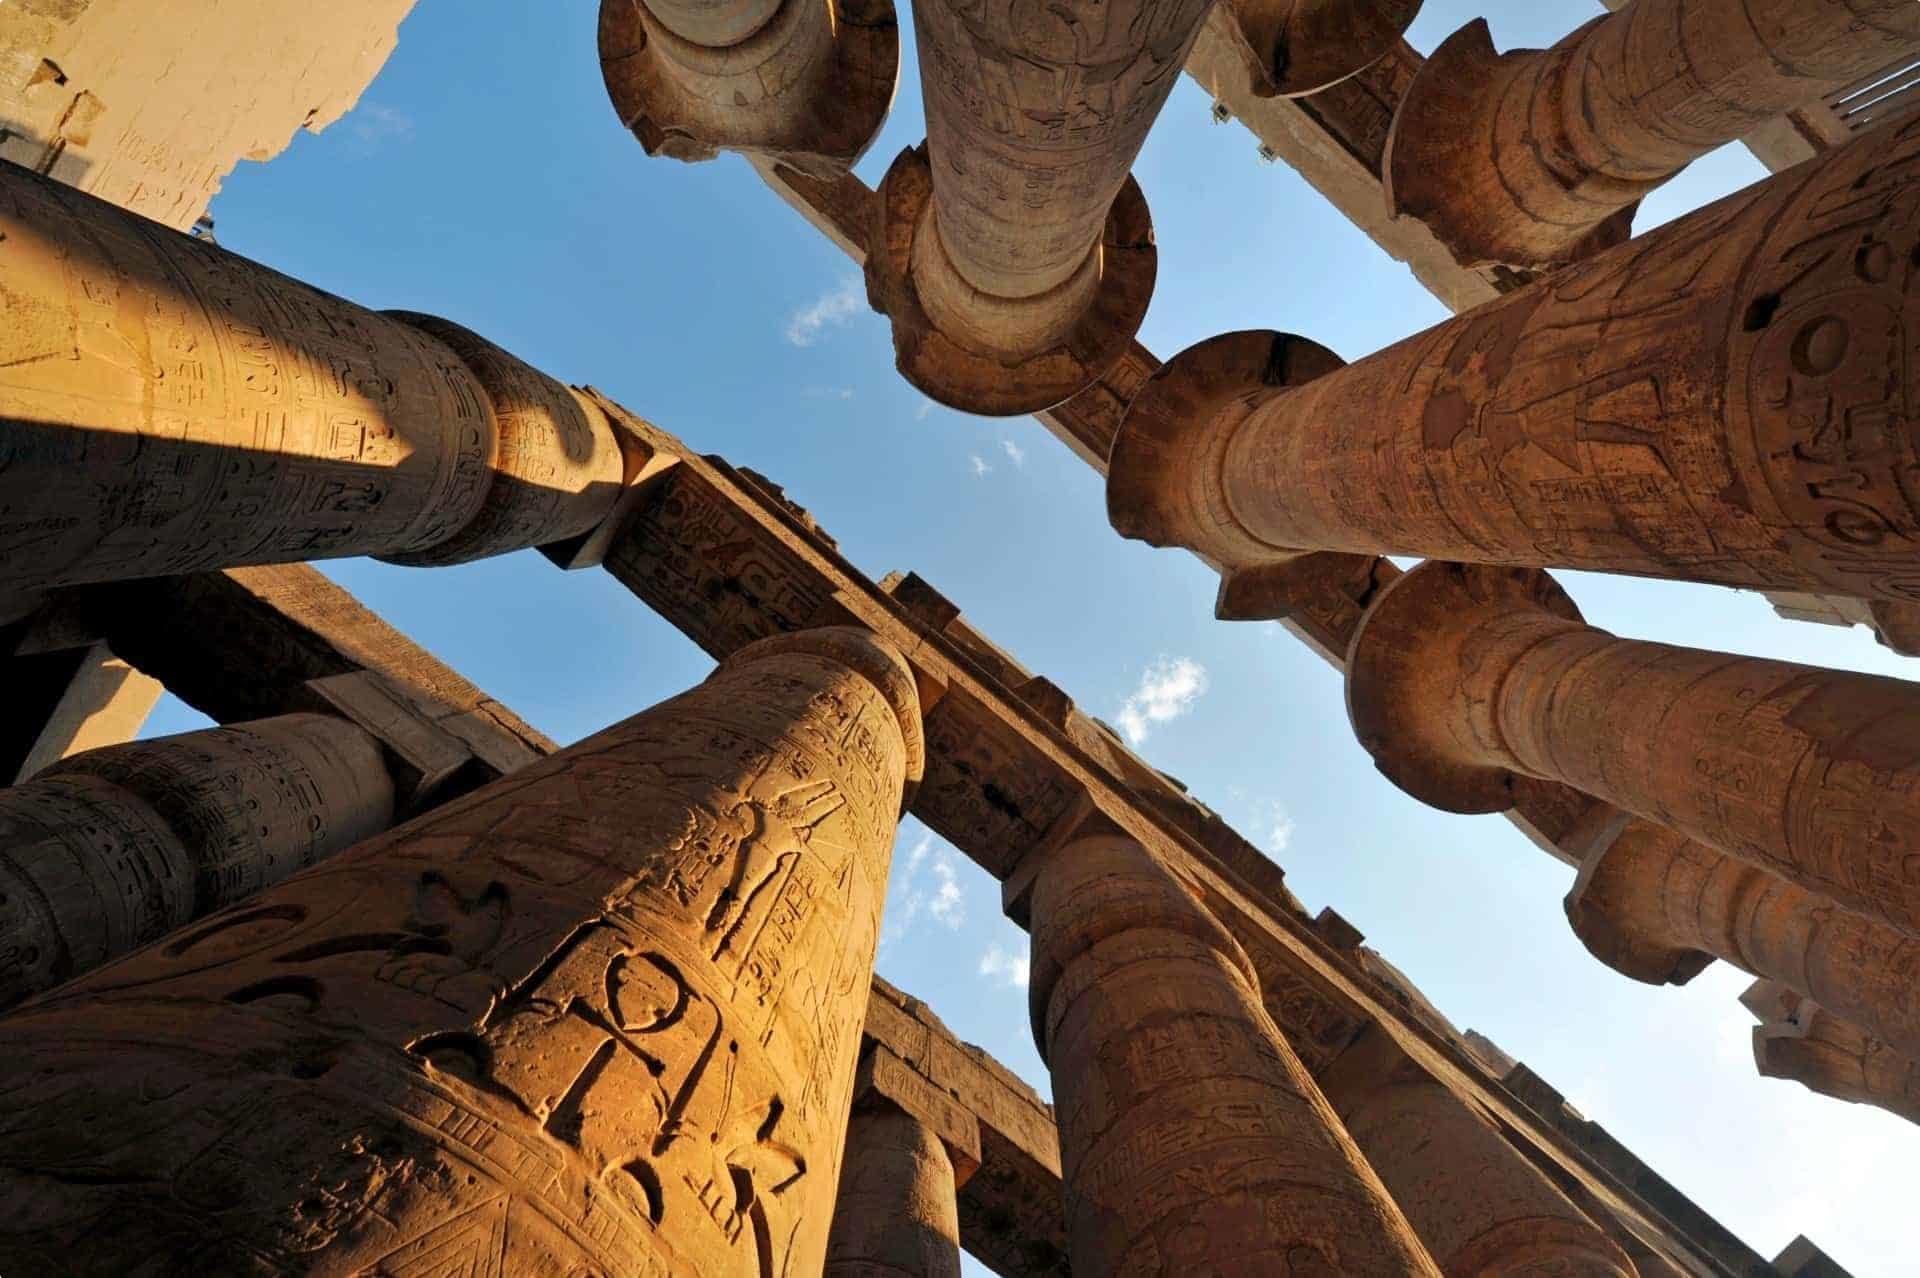 Egypt, Luxor - Thebes, Temples of Karnak